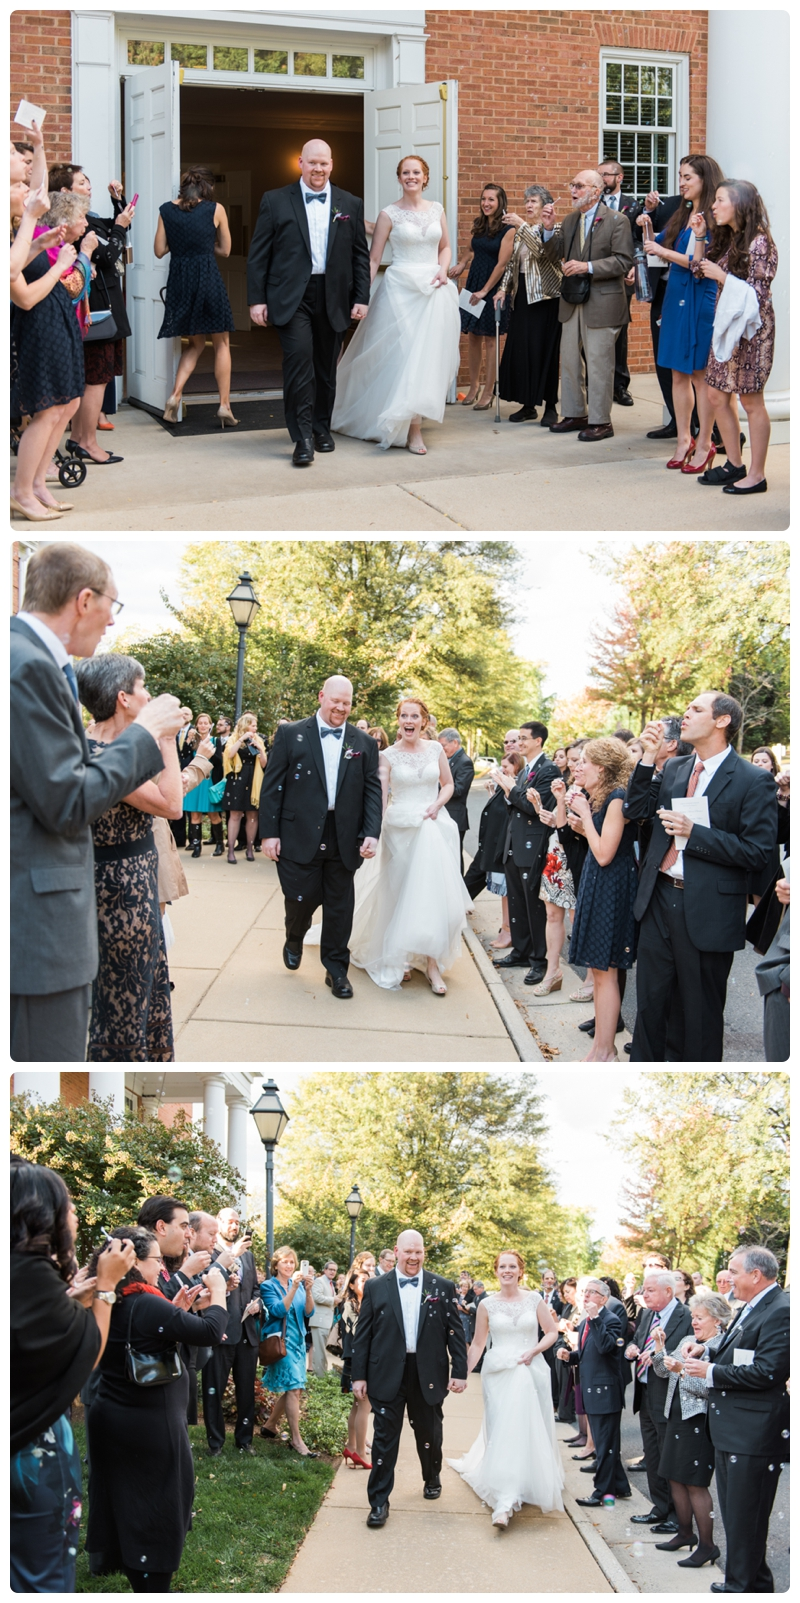 Wedding in Falls Church Virginia by Rachael Foster Photography_0020.jpg